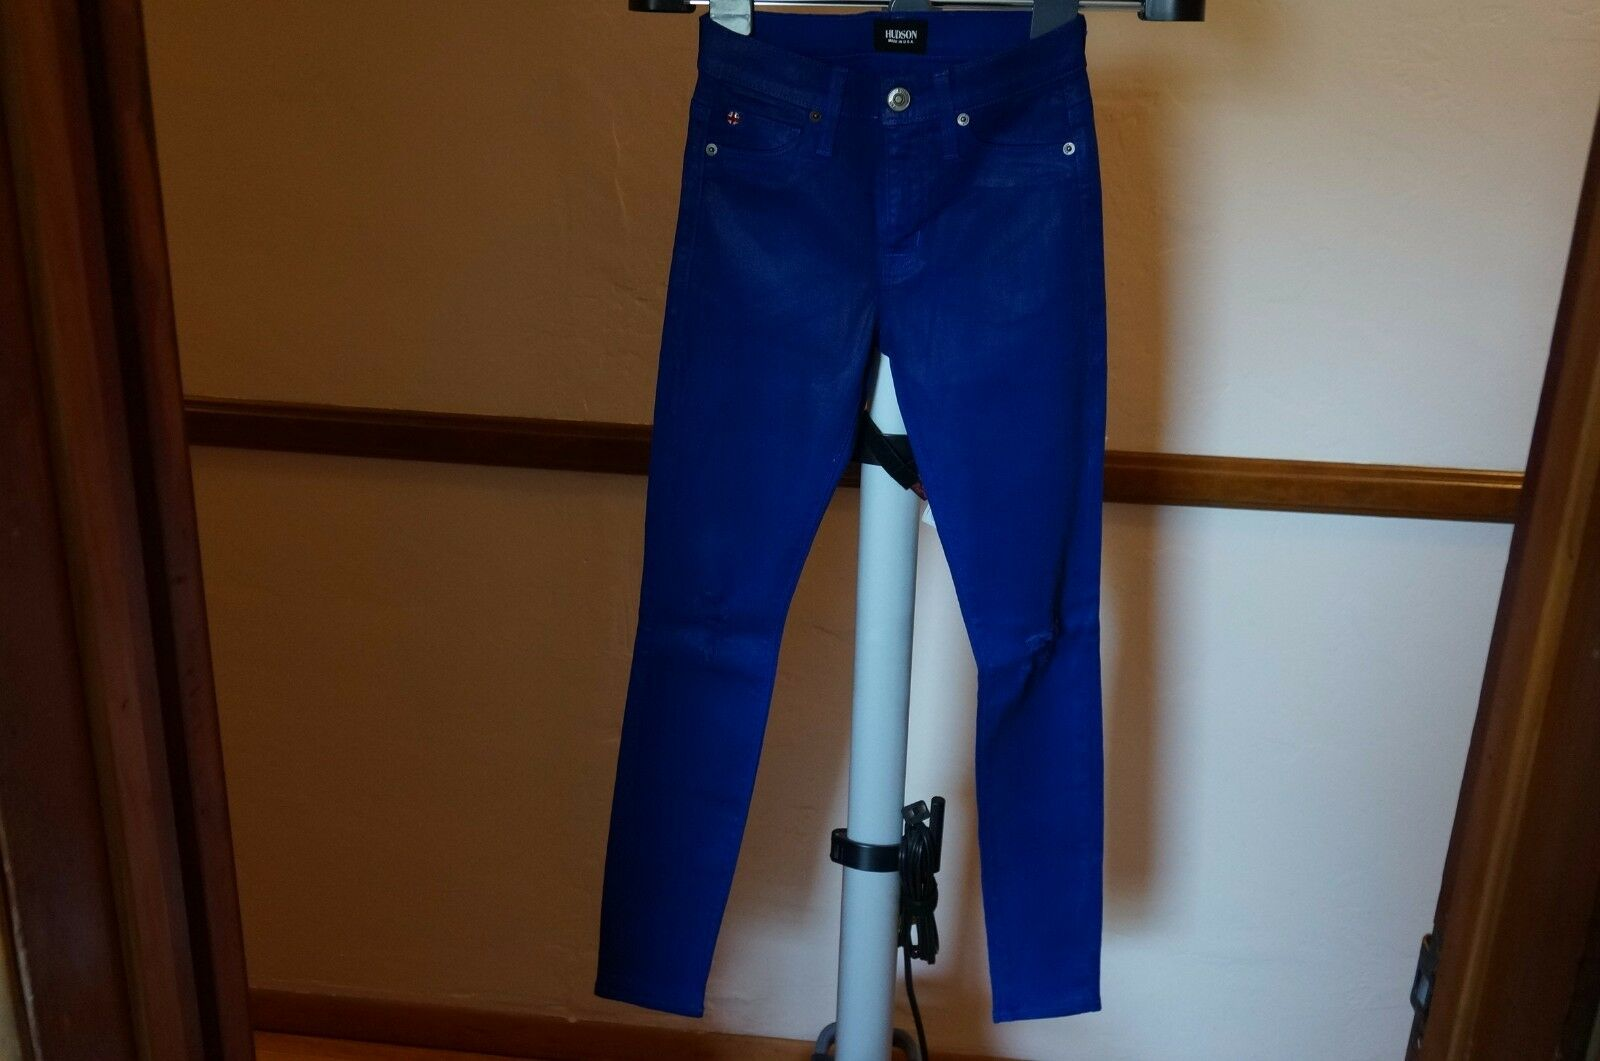 NEW HUDSON NICO MIDRISE SUPER SKINNY blueE MY MIND stretchy corduroy jeans 25 x29